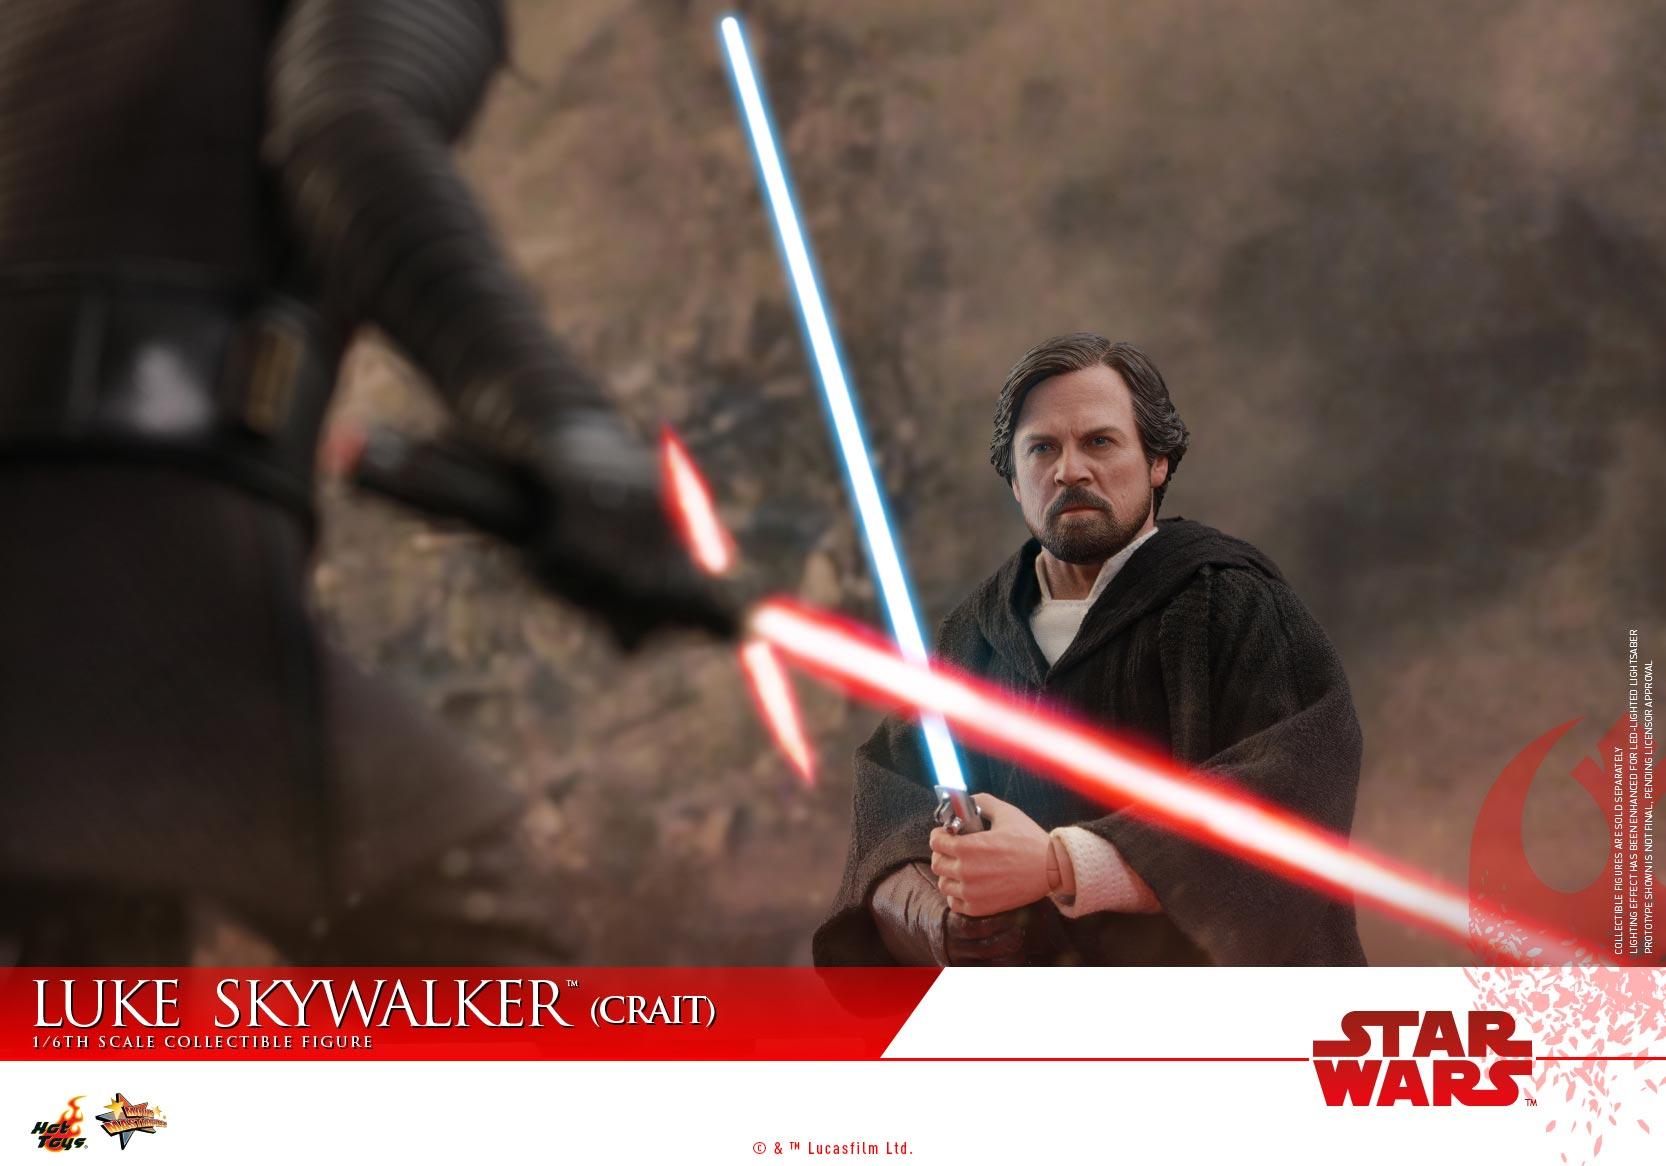 Hot Toys - SWTLJ - Luke Skywalker (Crait) collectible figure_PR (7)